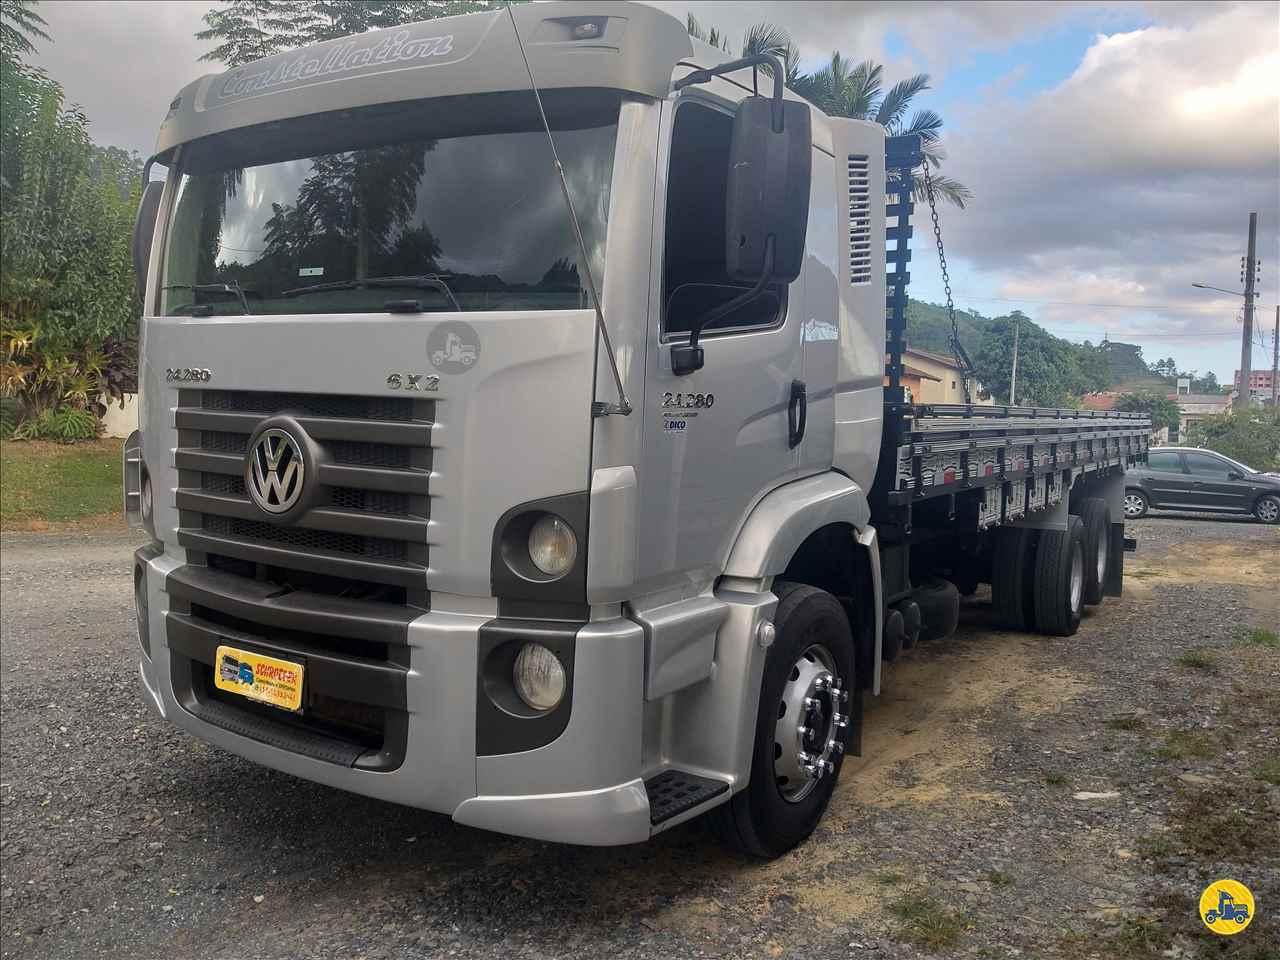 CAMINHAO VOLKSWAGEN VW 24280 Carga Seca Truck 6x2 Schroeder Caminhões ITUPORANGA SANTA CATARINA SC